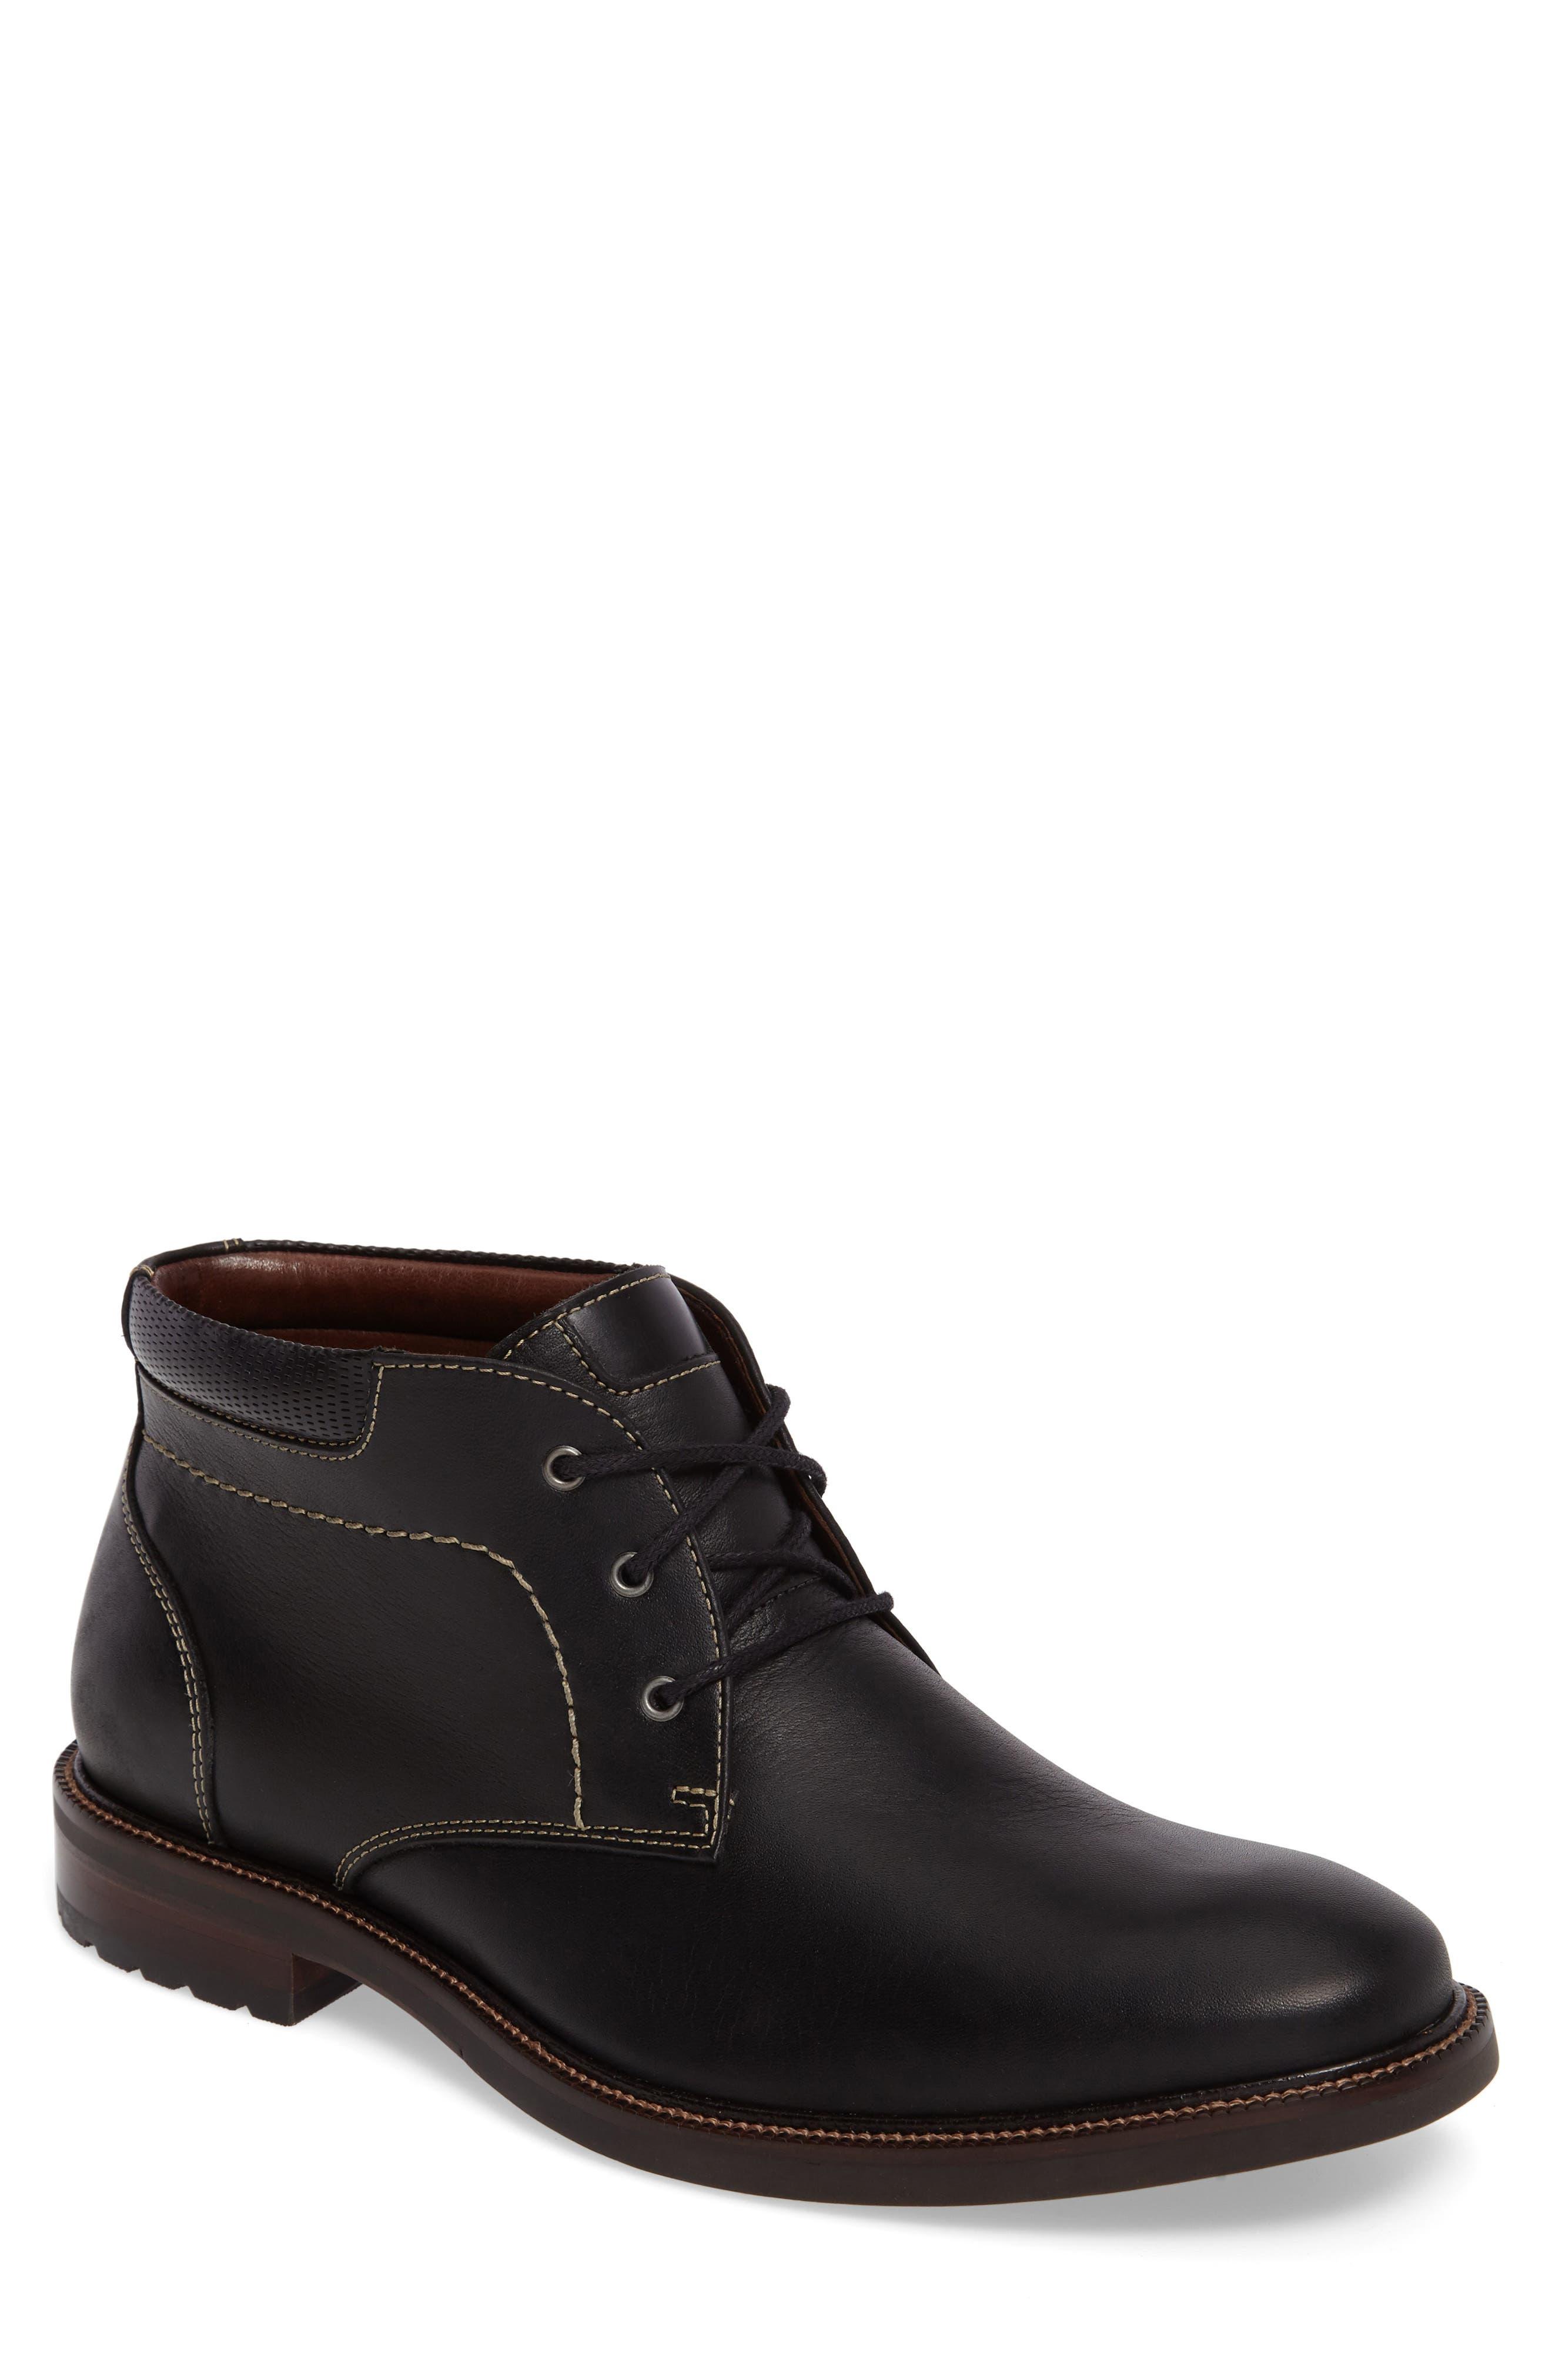 J&M Men's 1850 Baird Chukka Boot dRLn13